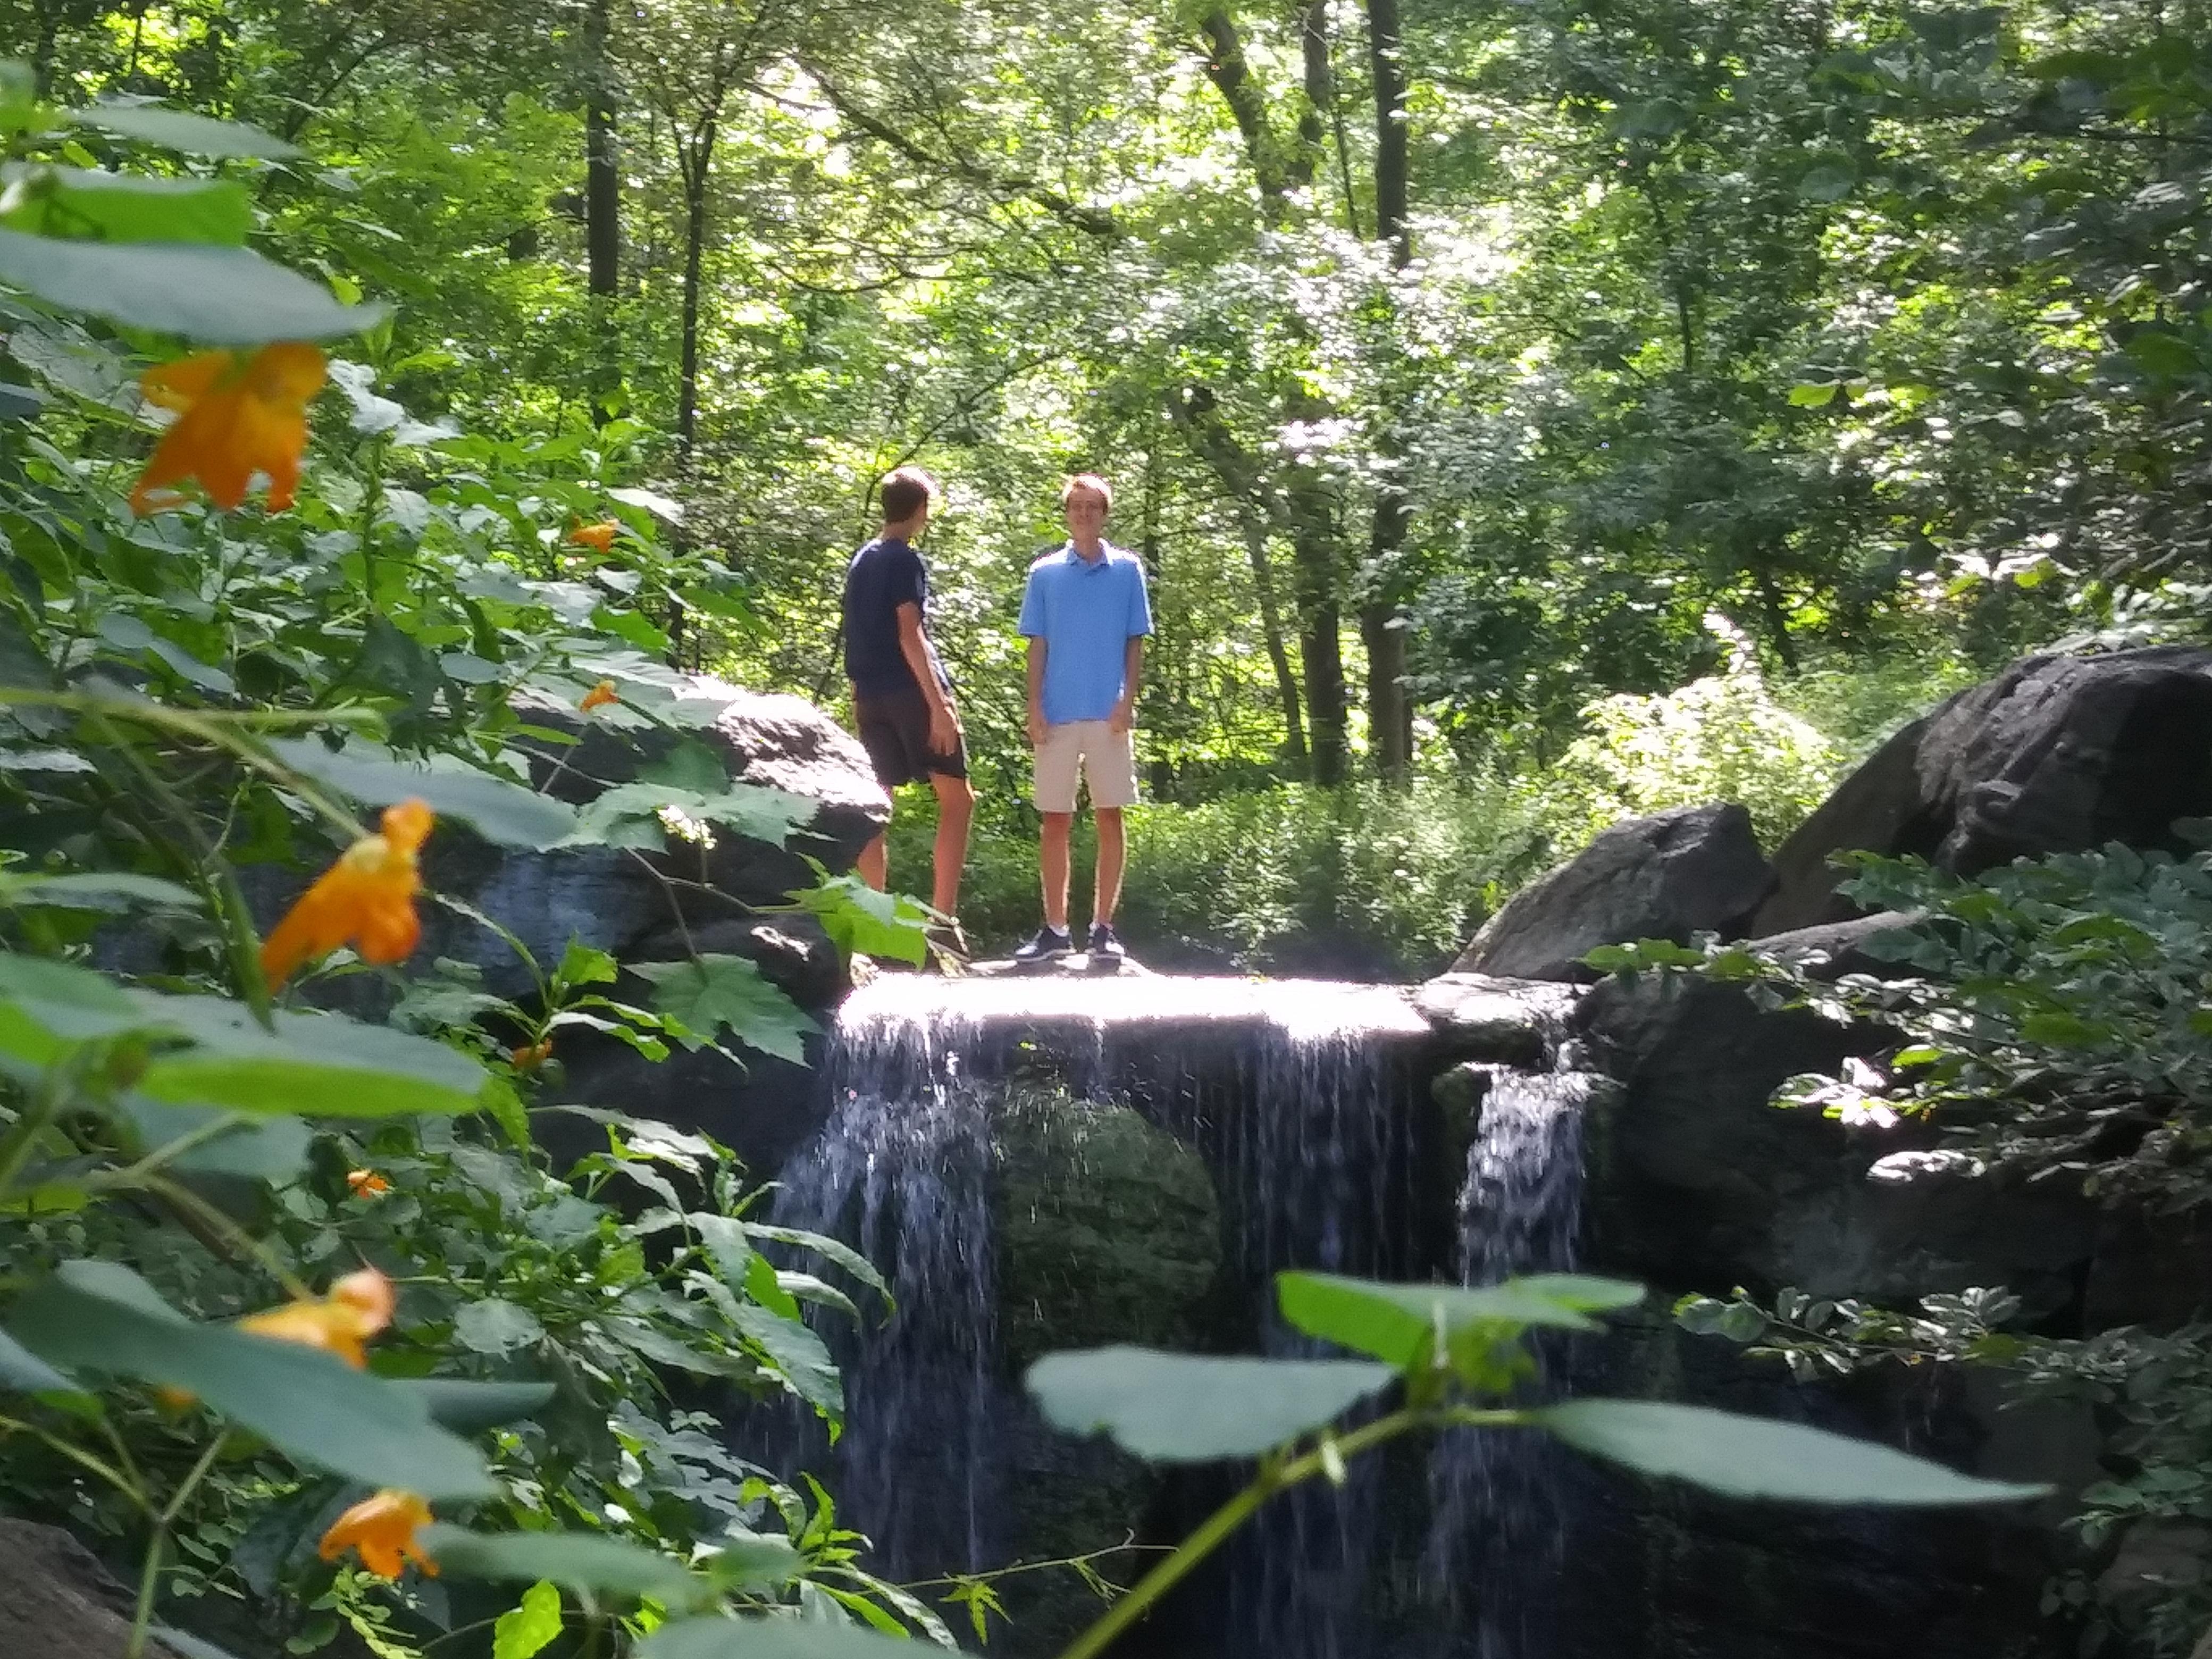 North Woods, Central Park, New York/ Kimberly Sullivan